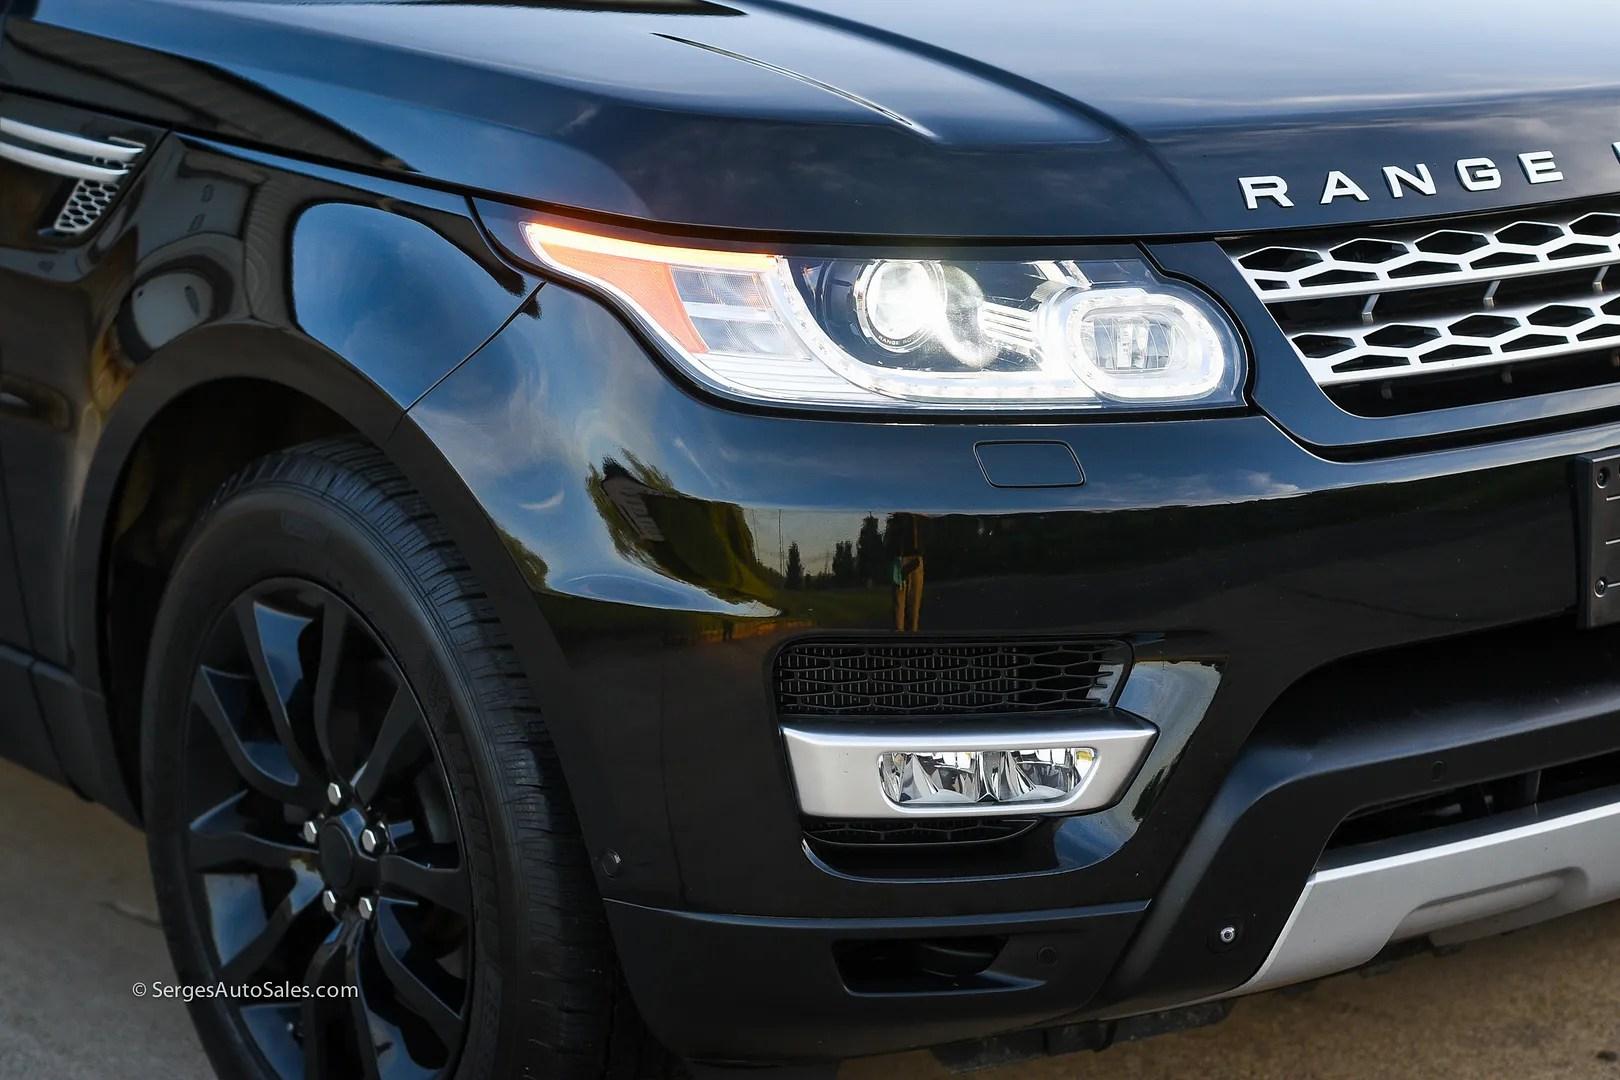 photo Serges-auto-sales-range-rover-for-sale-northeast-pa-20_zpsyt03lavd.jpg